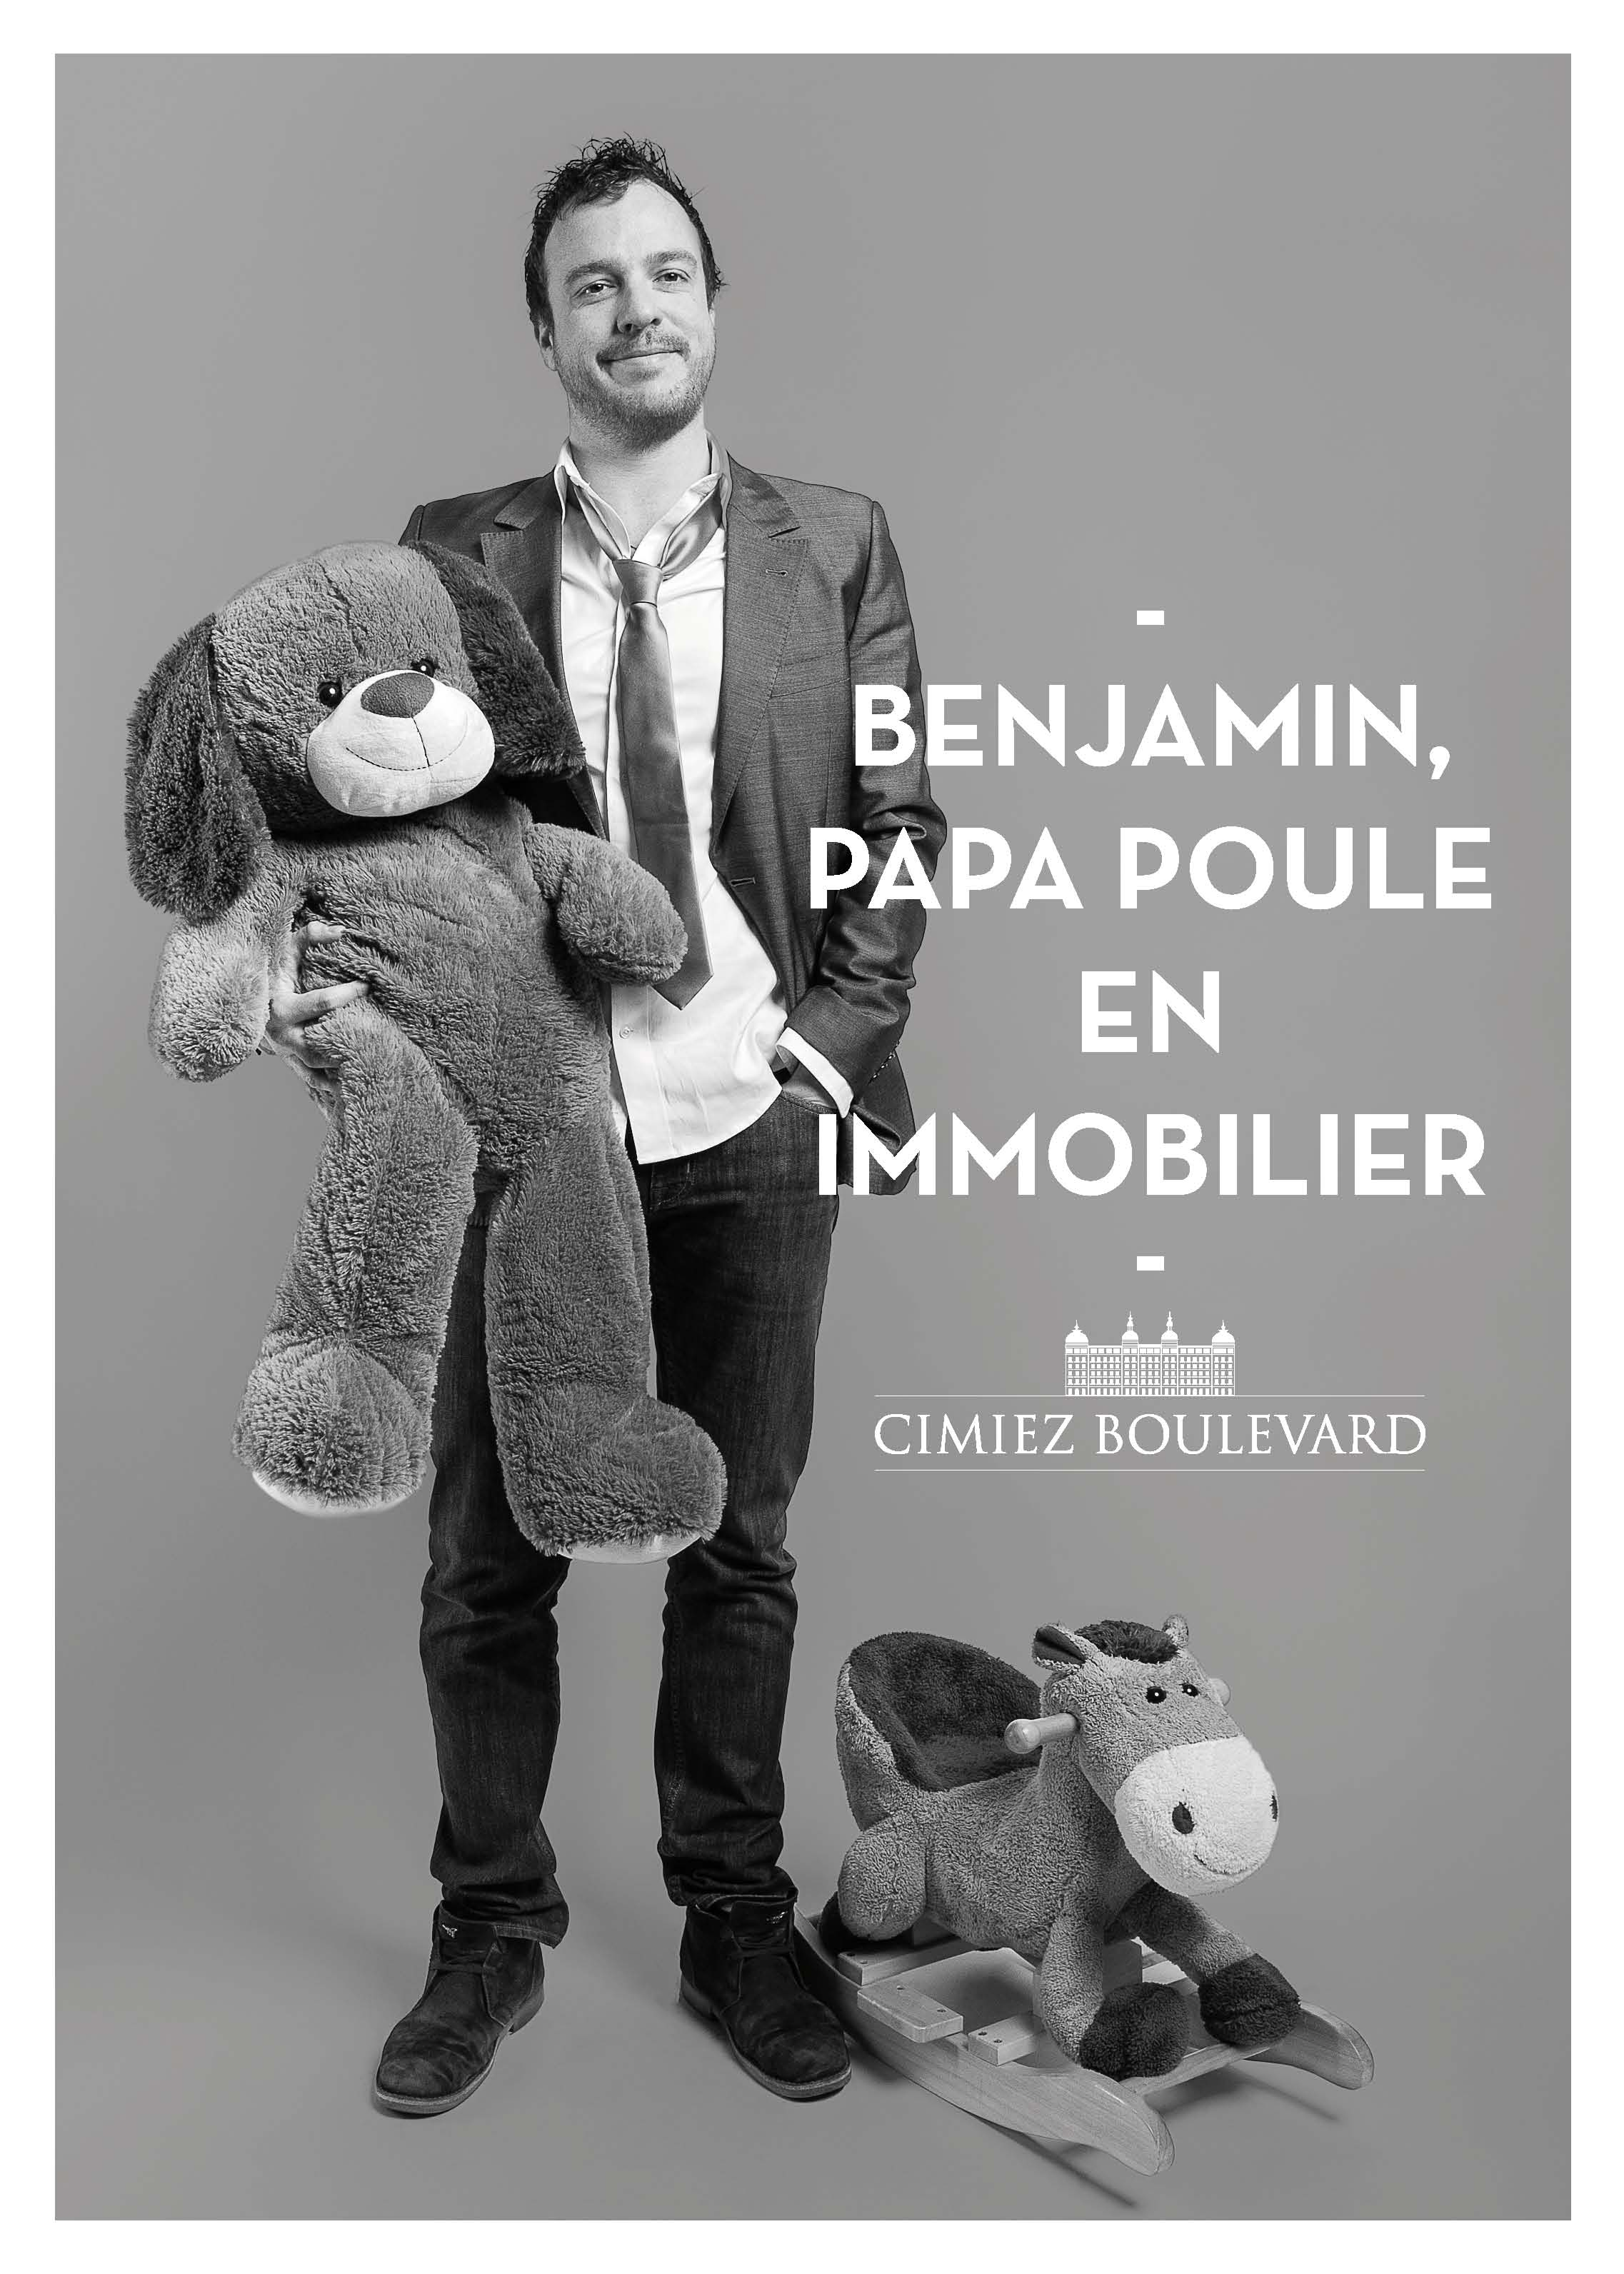 Honoraires d'agence - Interview Benjamin La Pietra Cimiez Boulevard